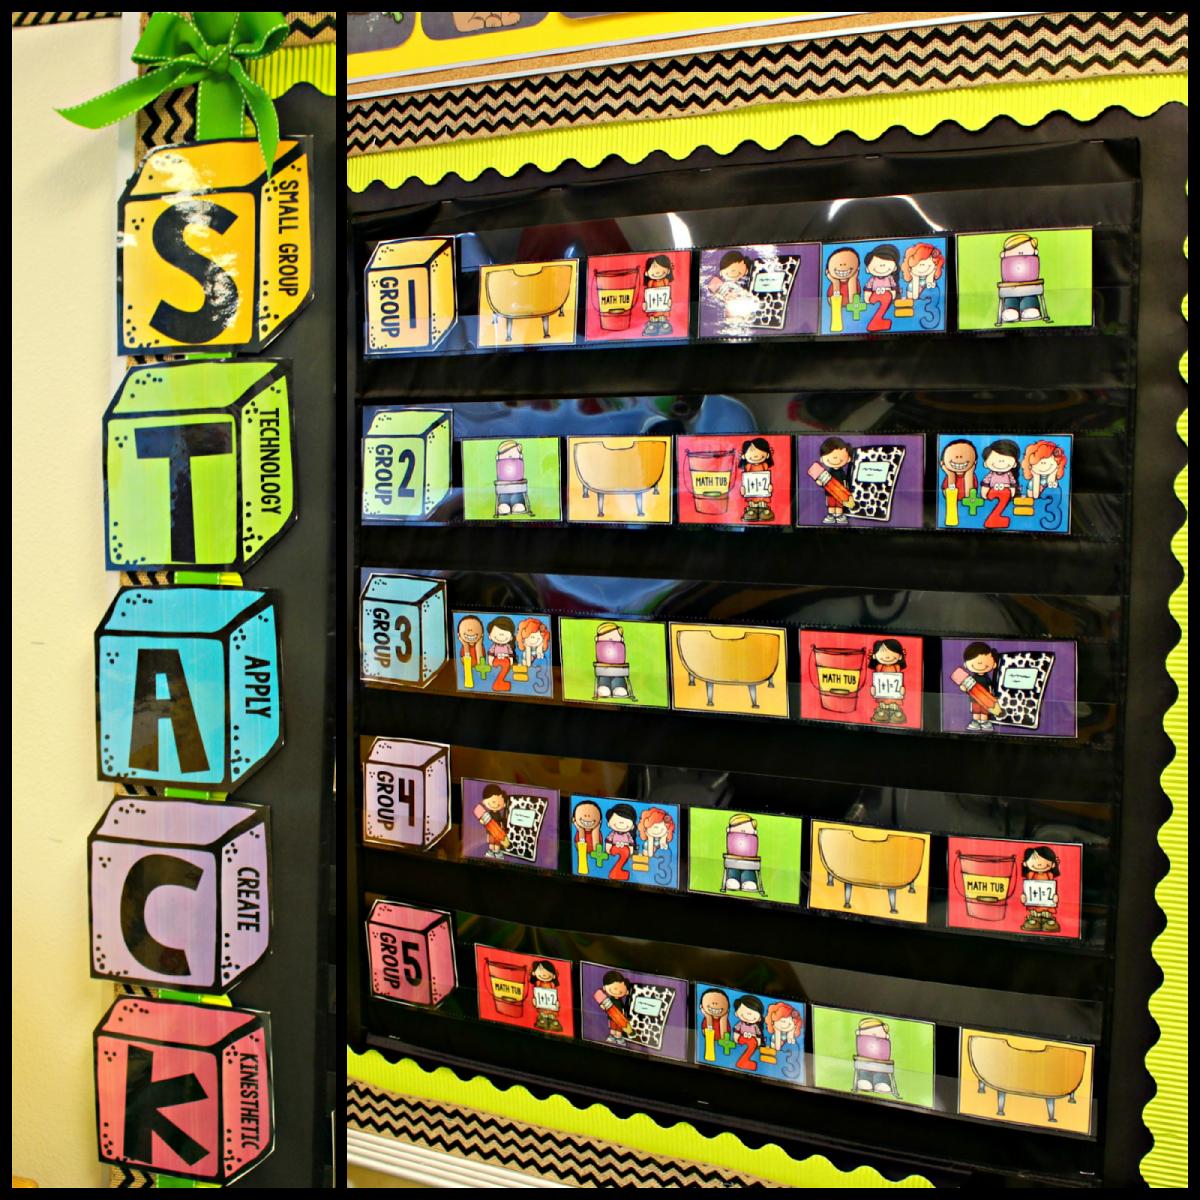 http://www.teacherspayteachers.com/Product/Guided-Math-Rotation-Board-1413492